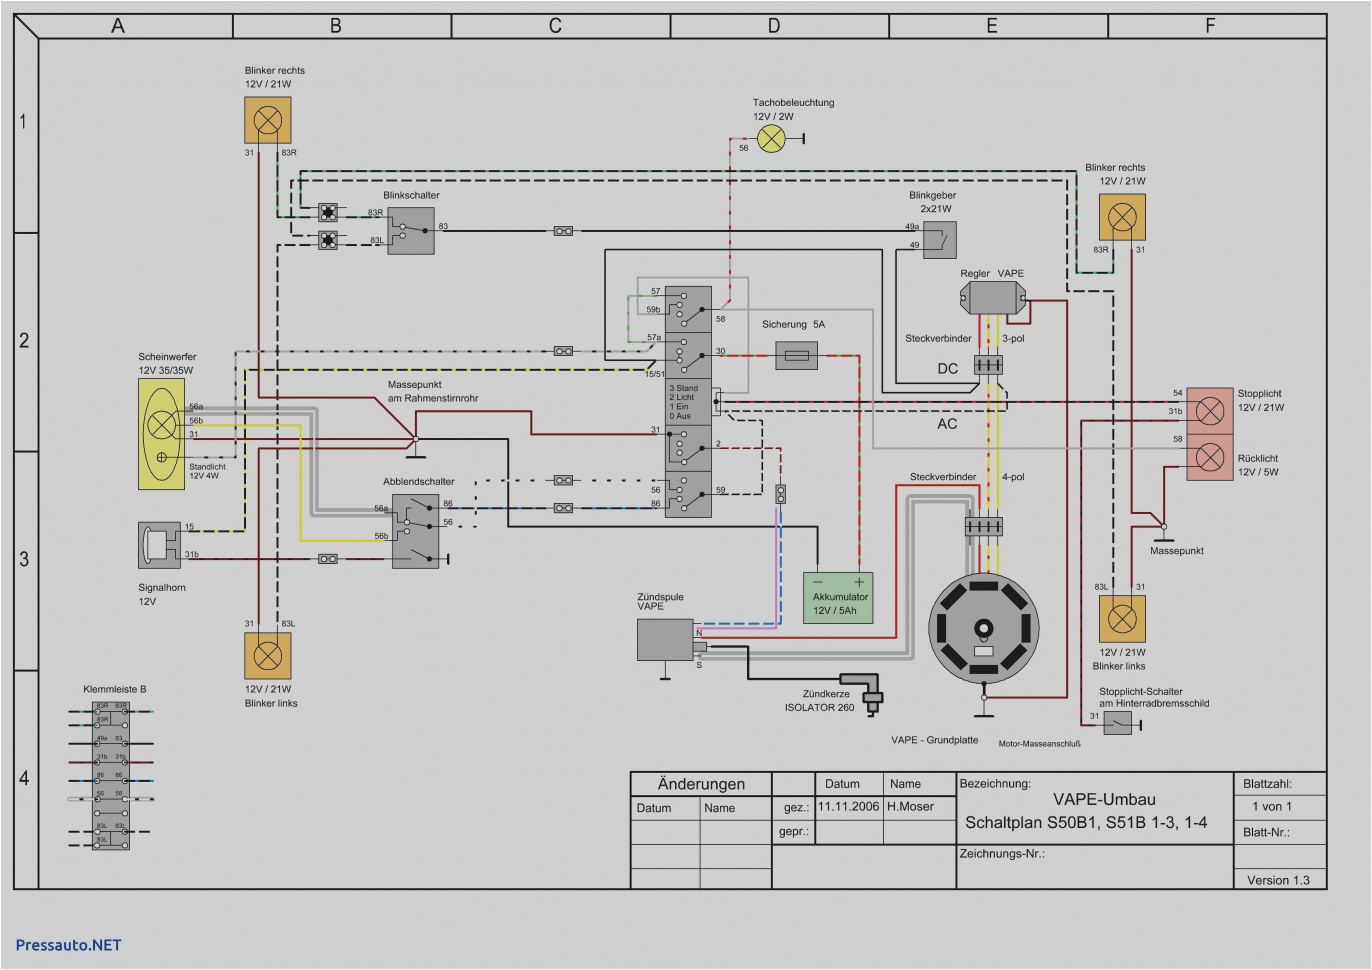 150 baja wiring diagram wiring diagram showbaja 150 vacuum line diagram baja circuit diagrams wiring diagram